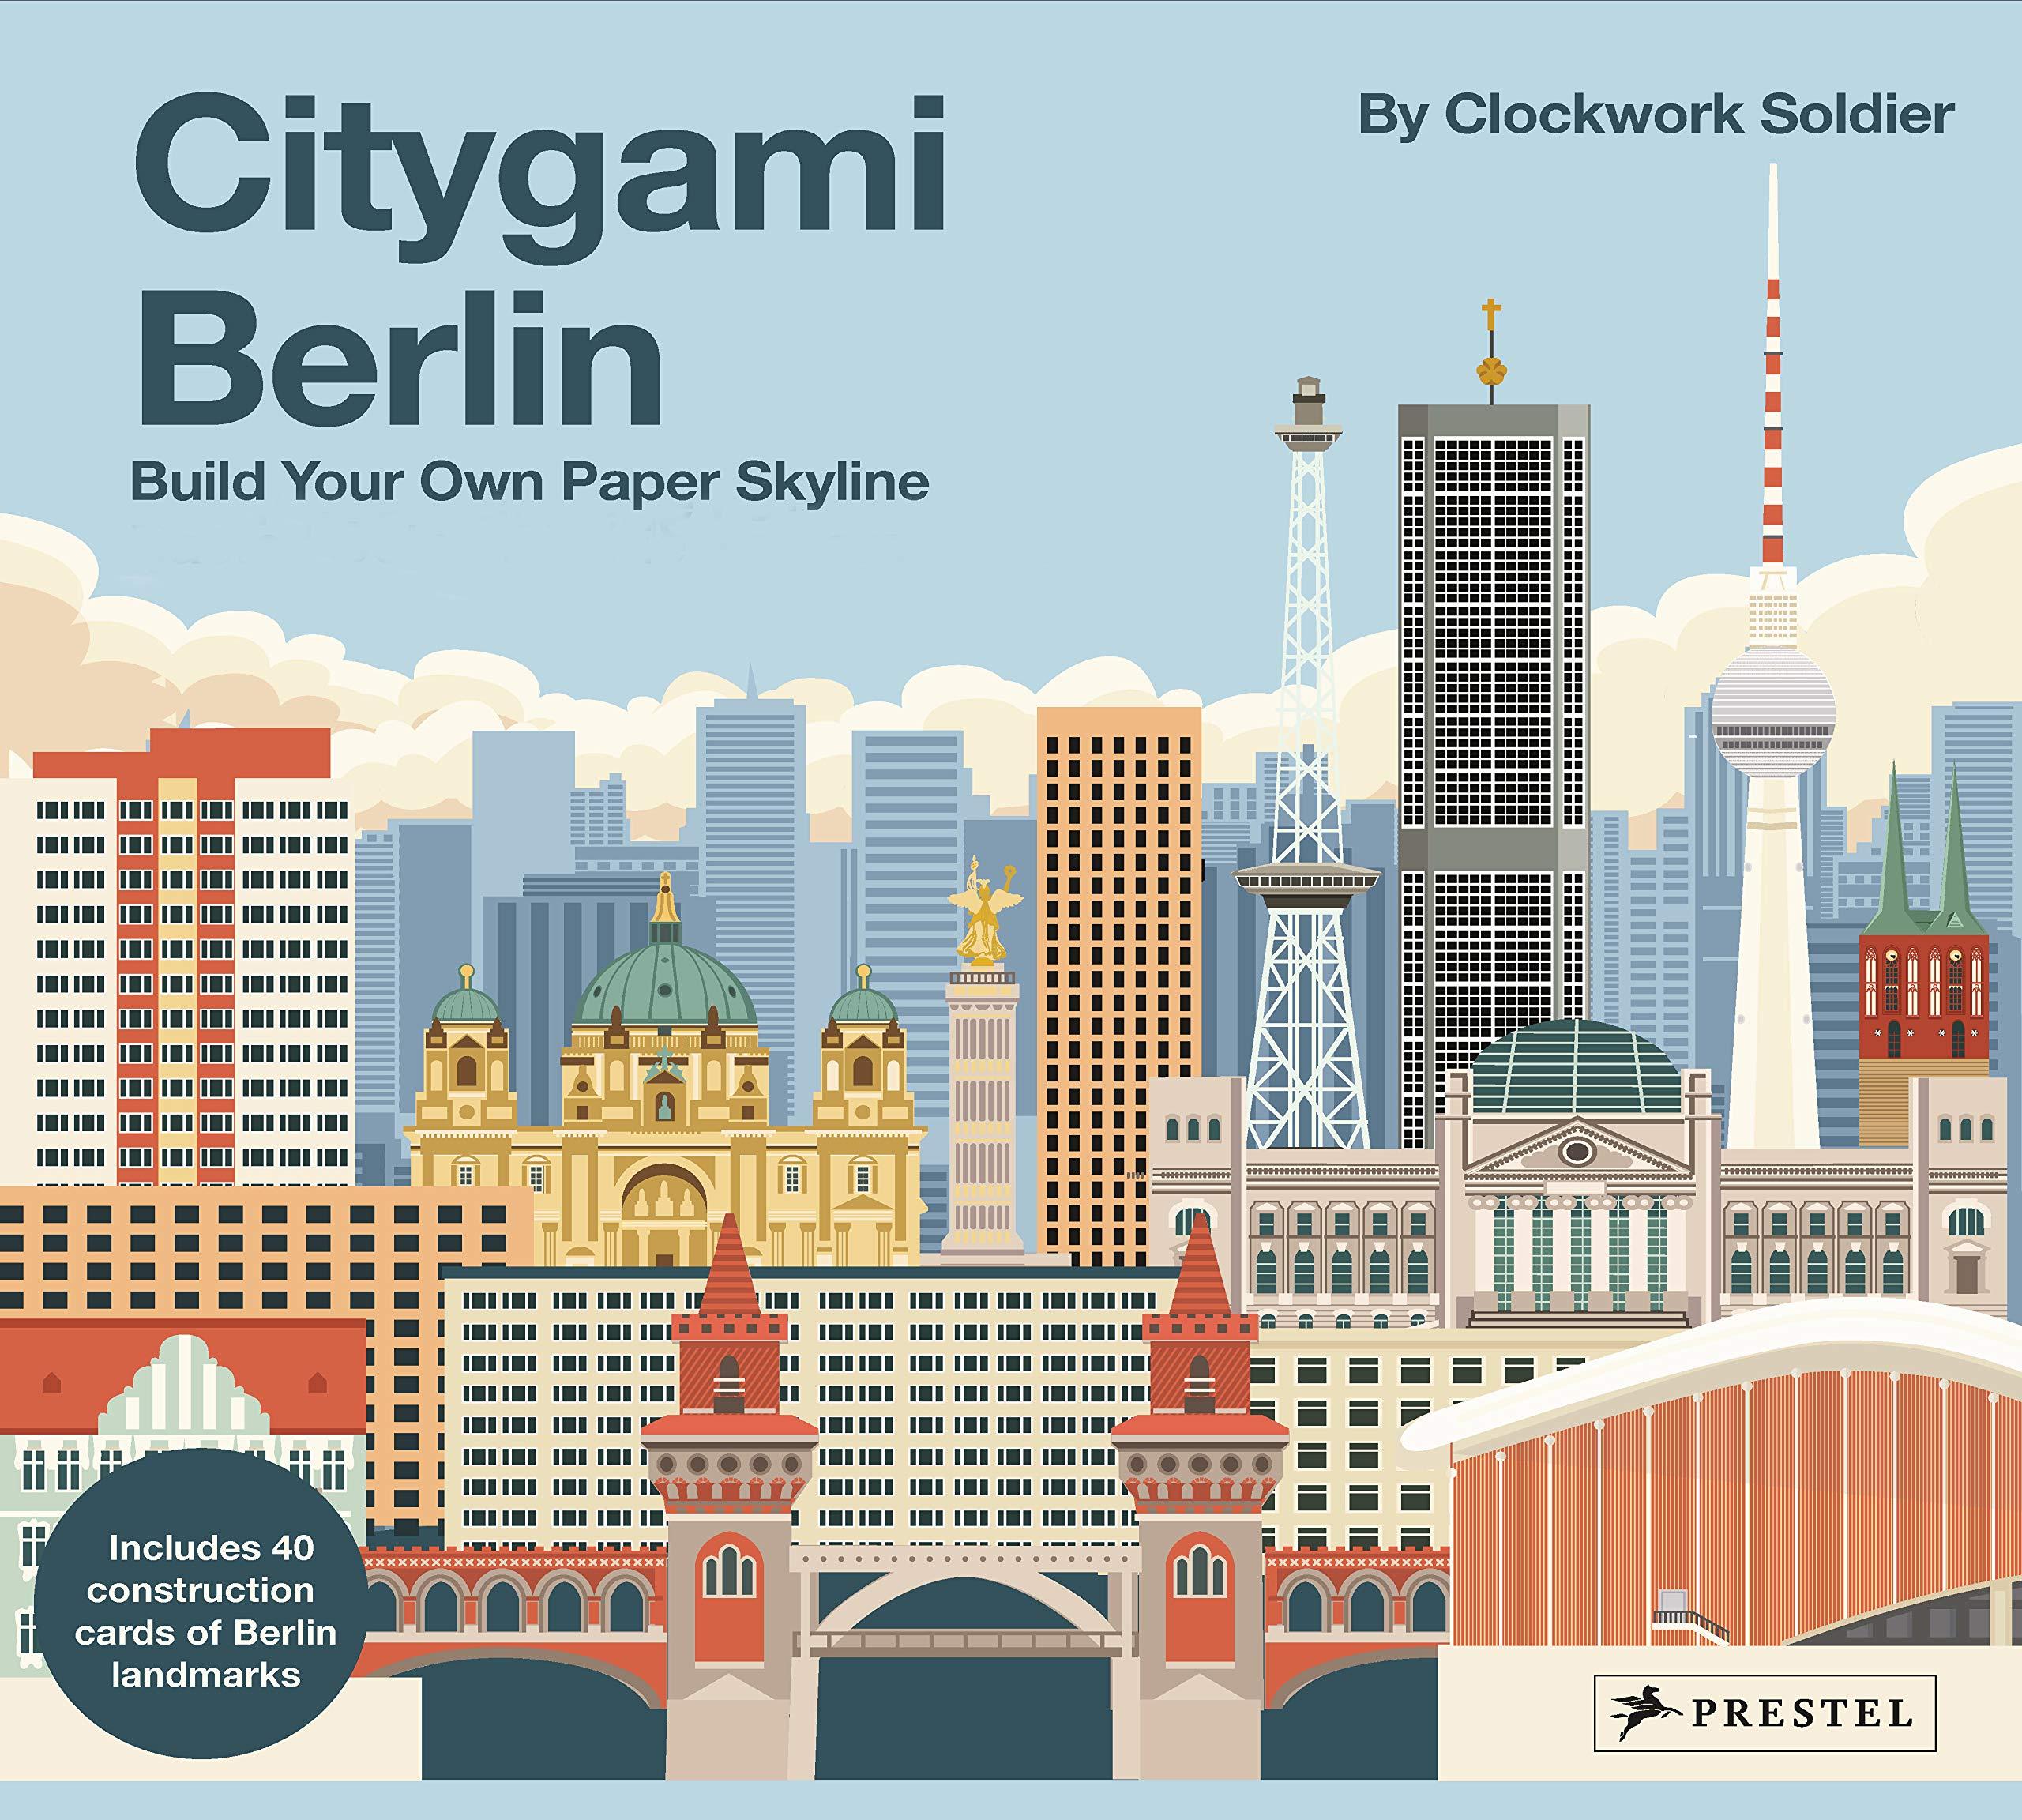 Citygami Berlin  Build Your Own Paper Skyline   Gestalte Aus Papier Die Bauwerke Der Stadt